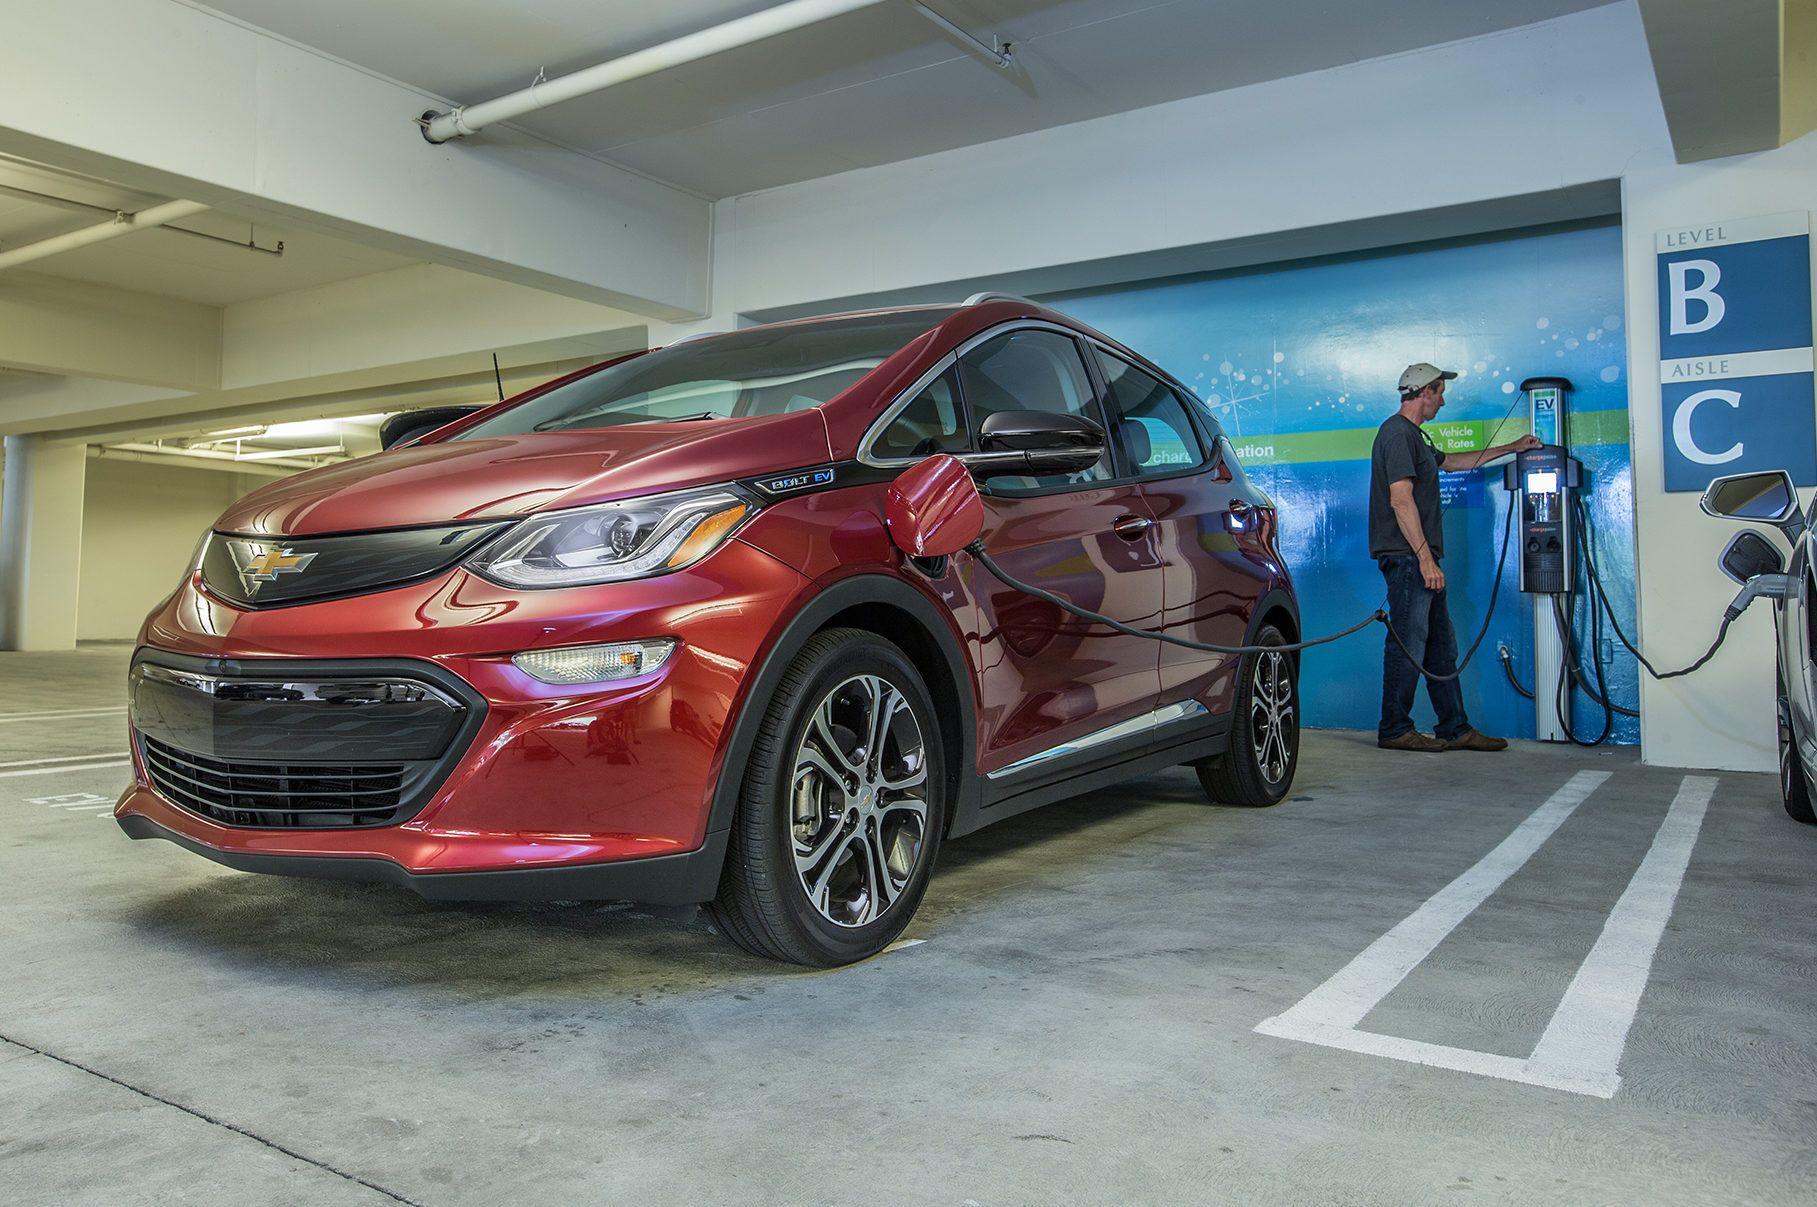 2017 Chevrolet Bolt Ev Review Long Term Update 1 Chevrolet